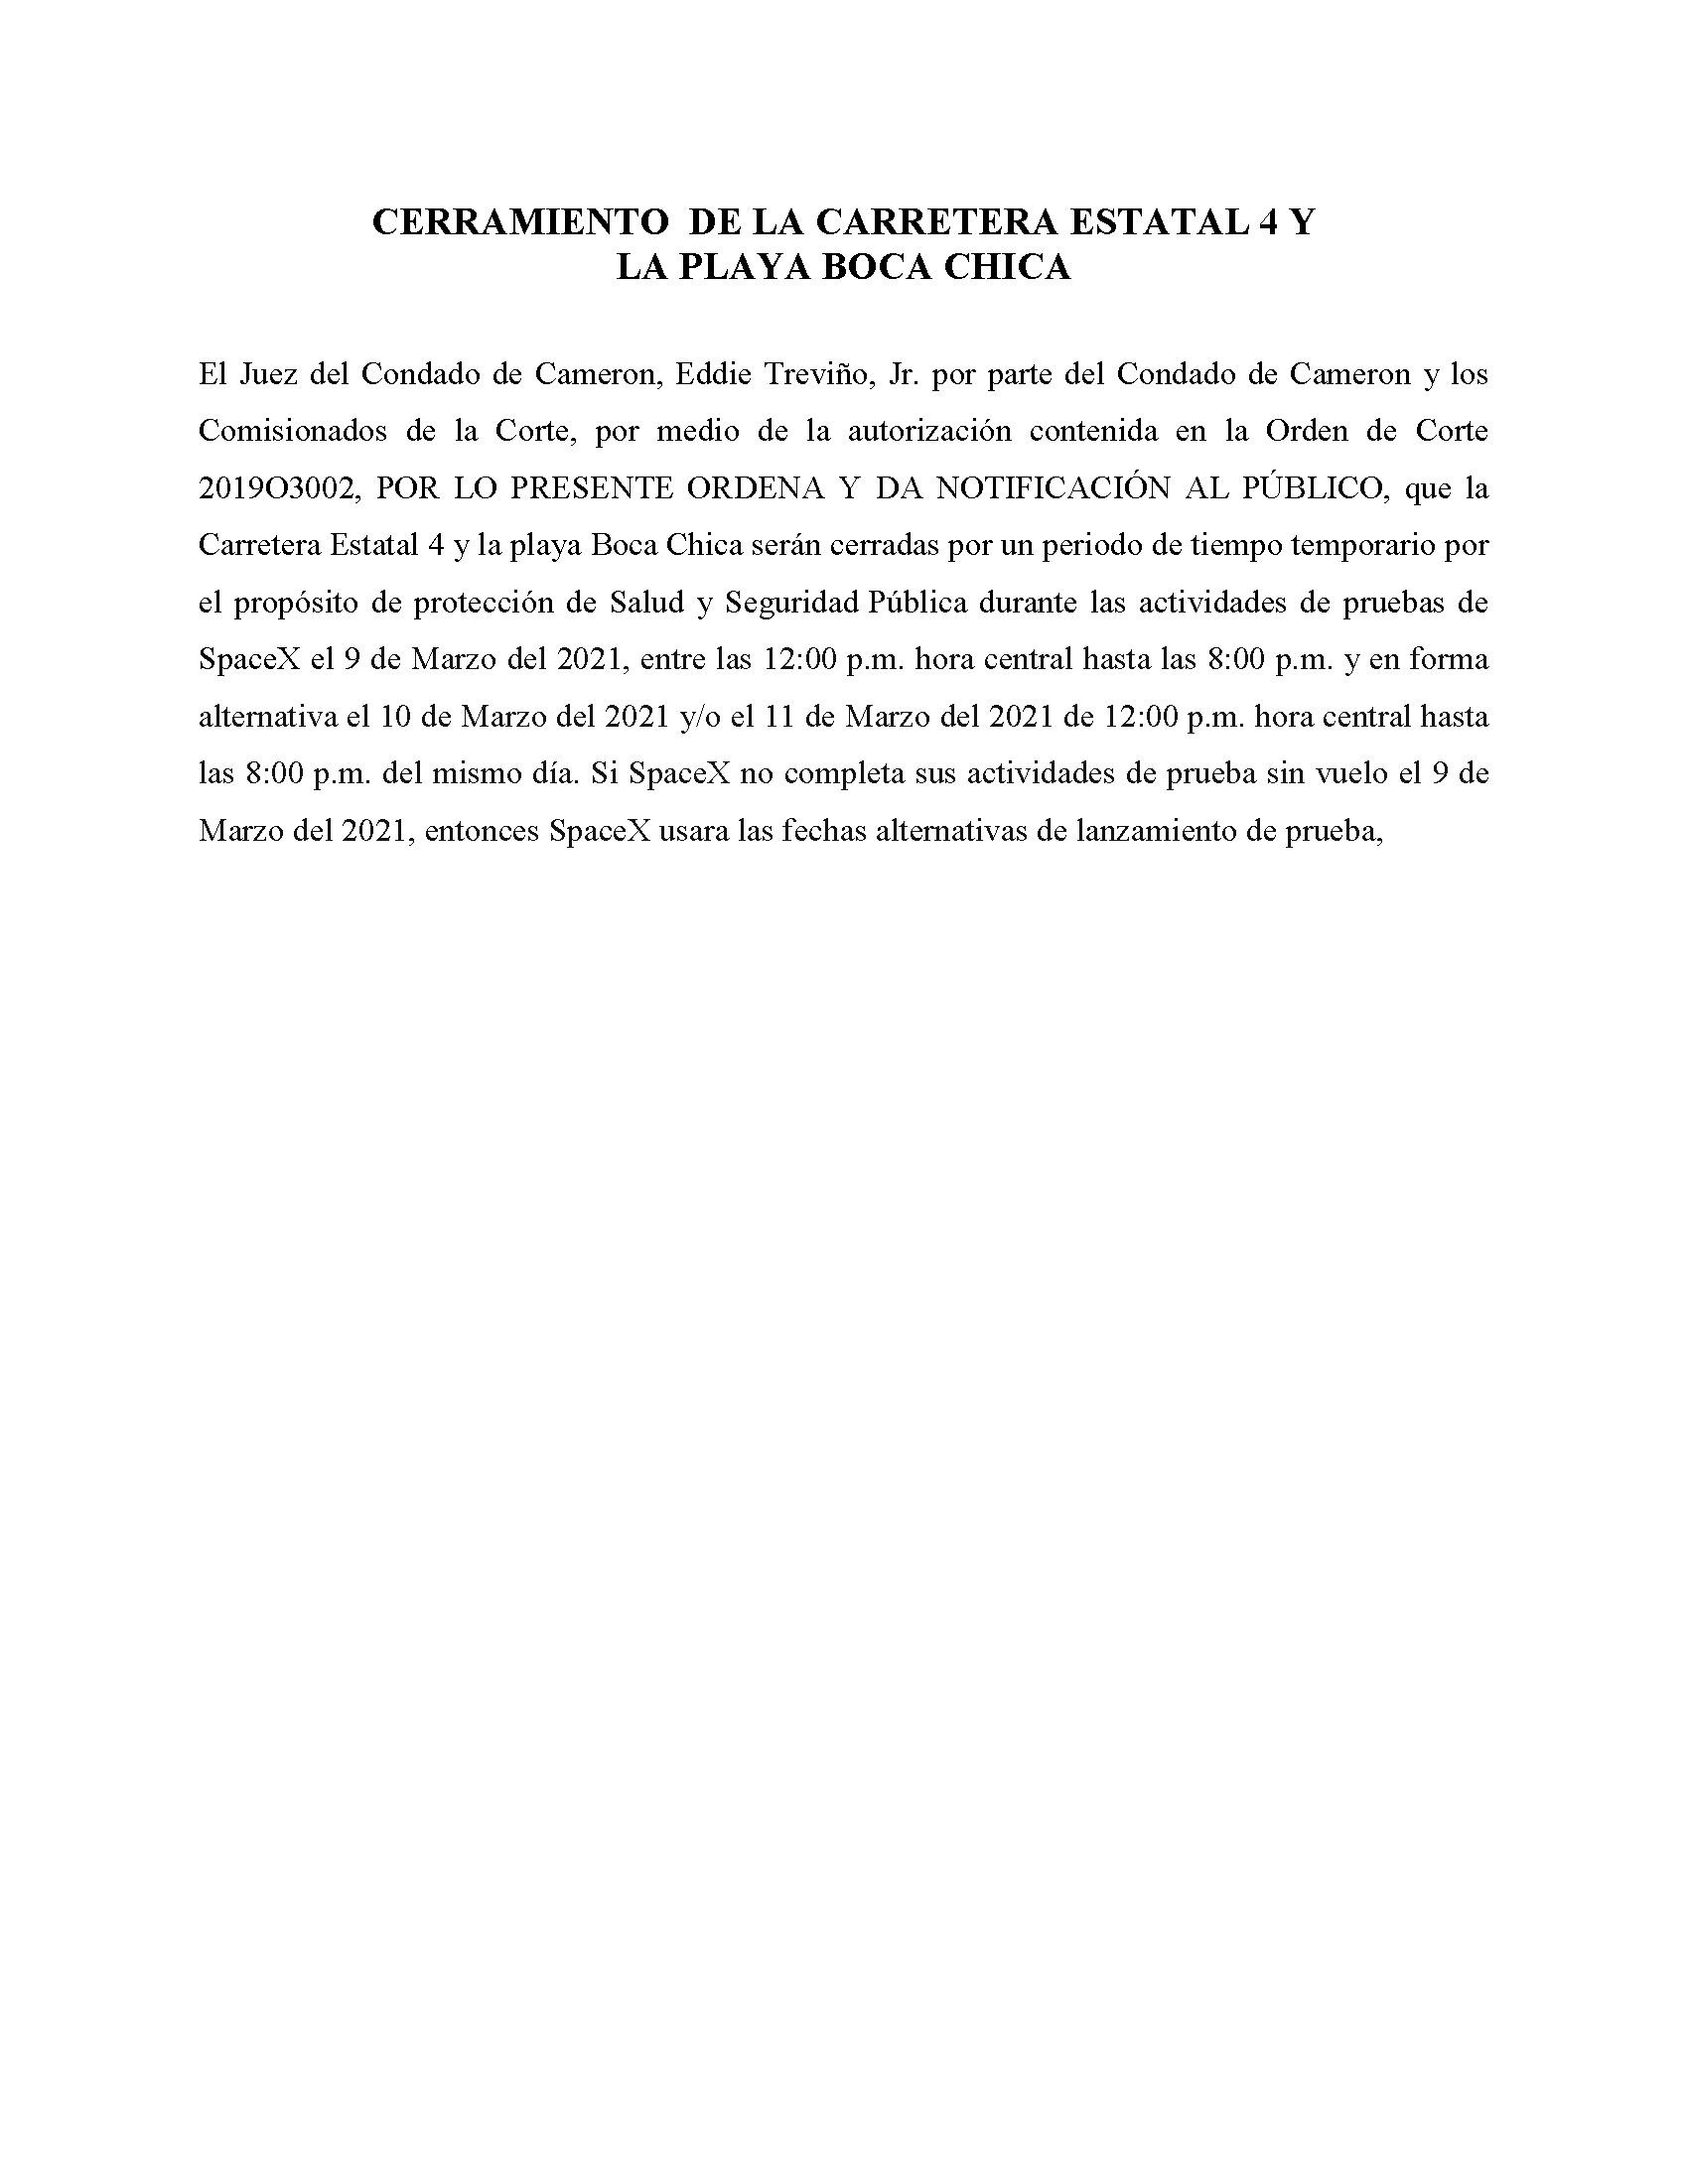 ORDER.CLOSURE OF HIGHWAY 4 Y LA PLAYA BOCA CHICA.SPANISH.03.09.2021